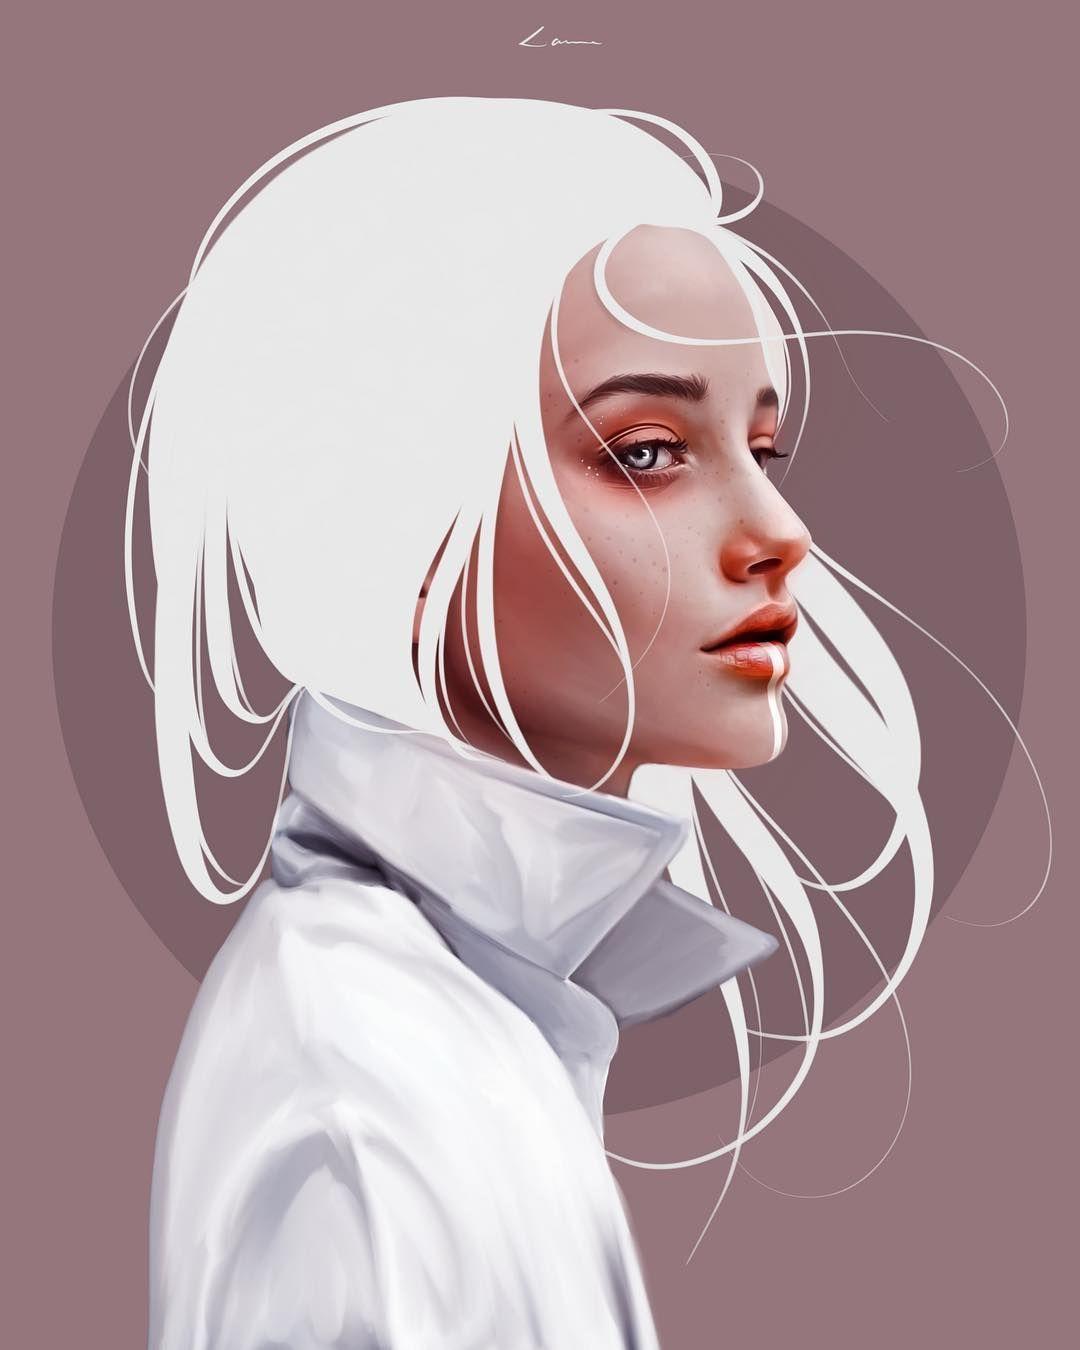 Laura H. Rubin is a 25-year-old digital artist and illustrator based in Bern, Switzerland. For more view website.    #digitalart #digitalartgirl #digitalpainting #illustrationart #illustration #digitalillustrations #surrealart #digitaldrawing